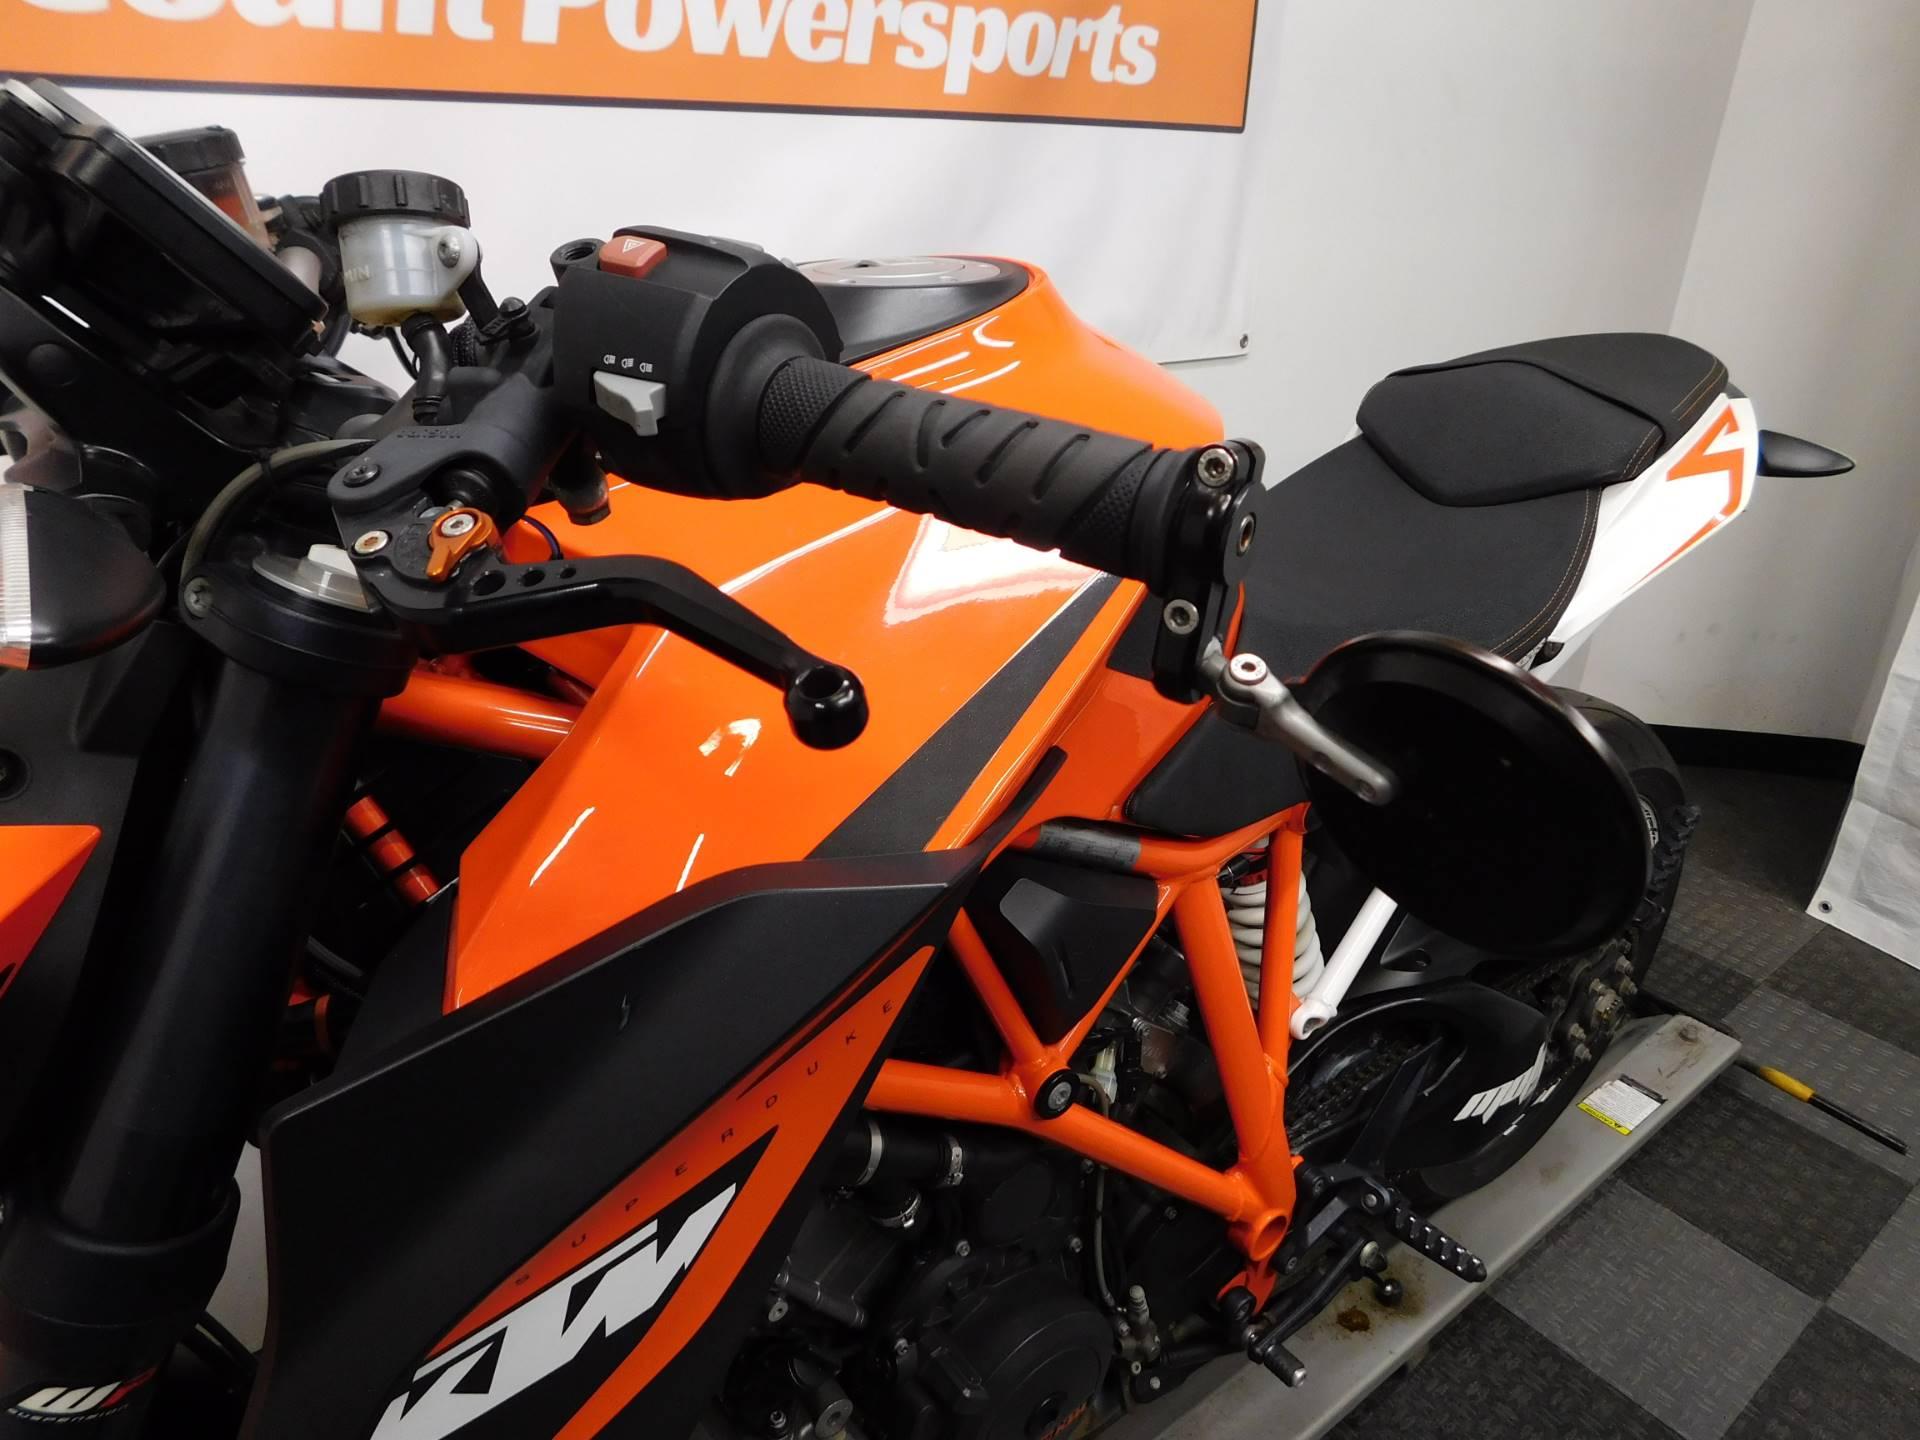 2015 KTM 1290 Super Duke R 10